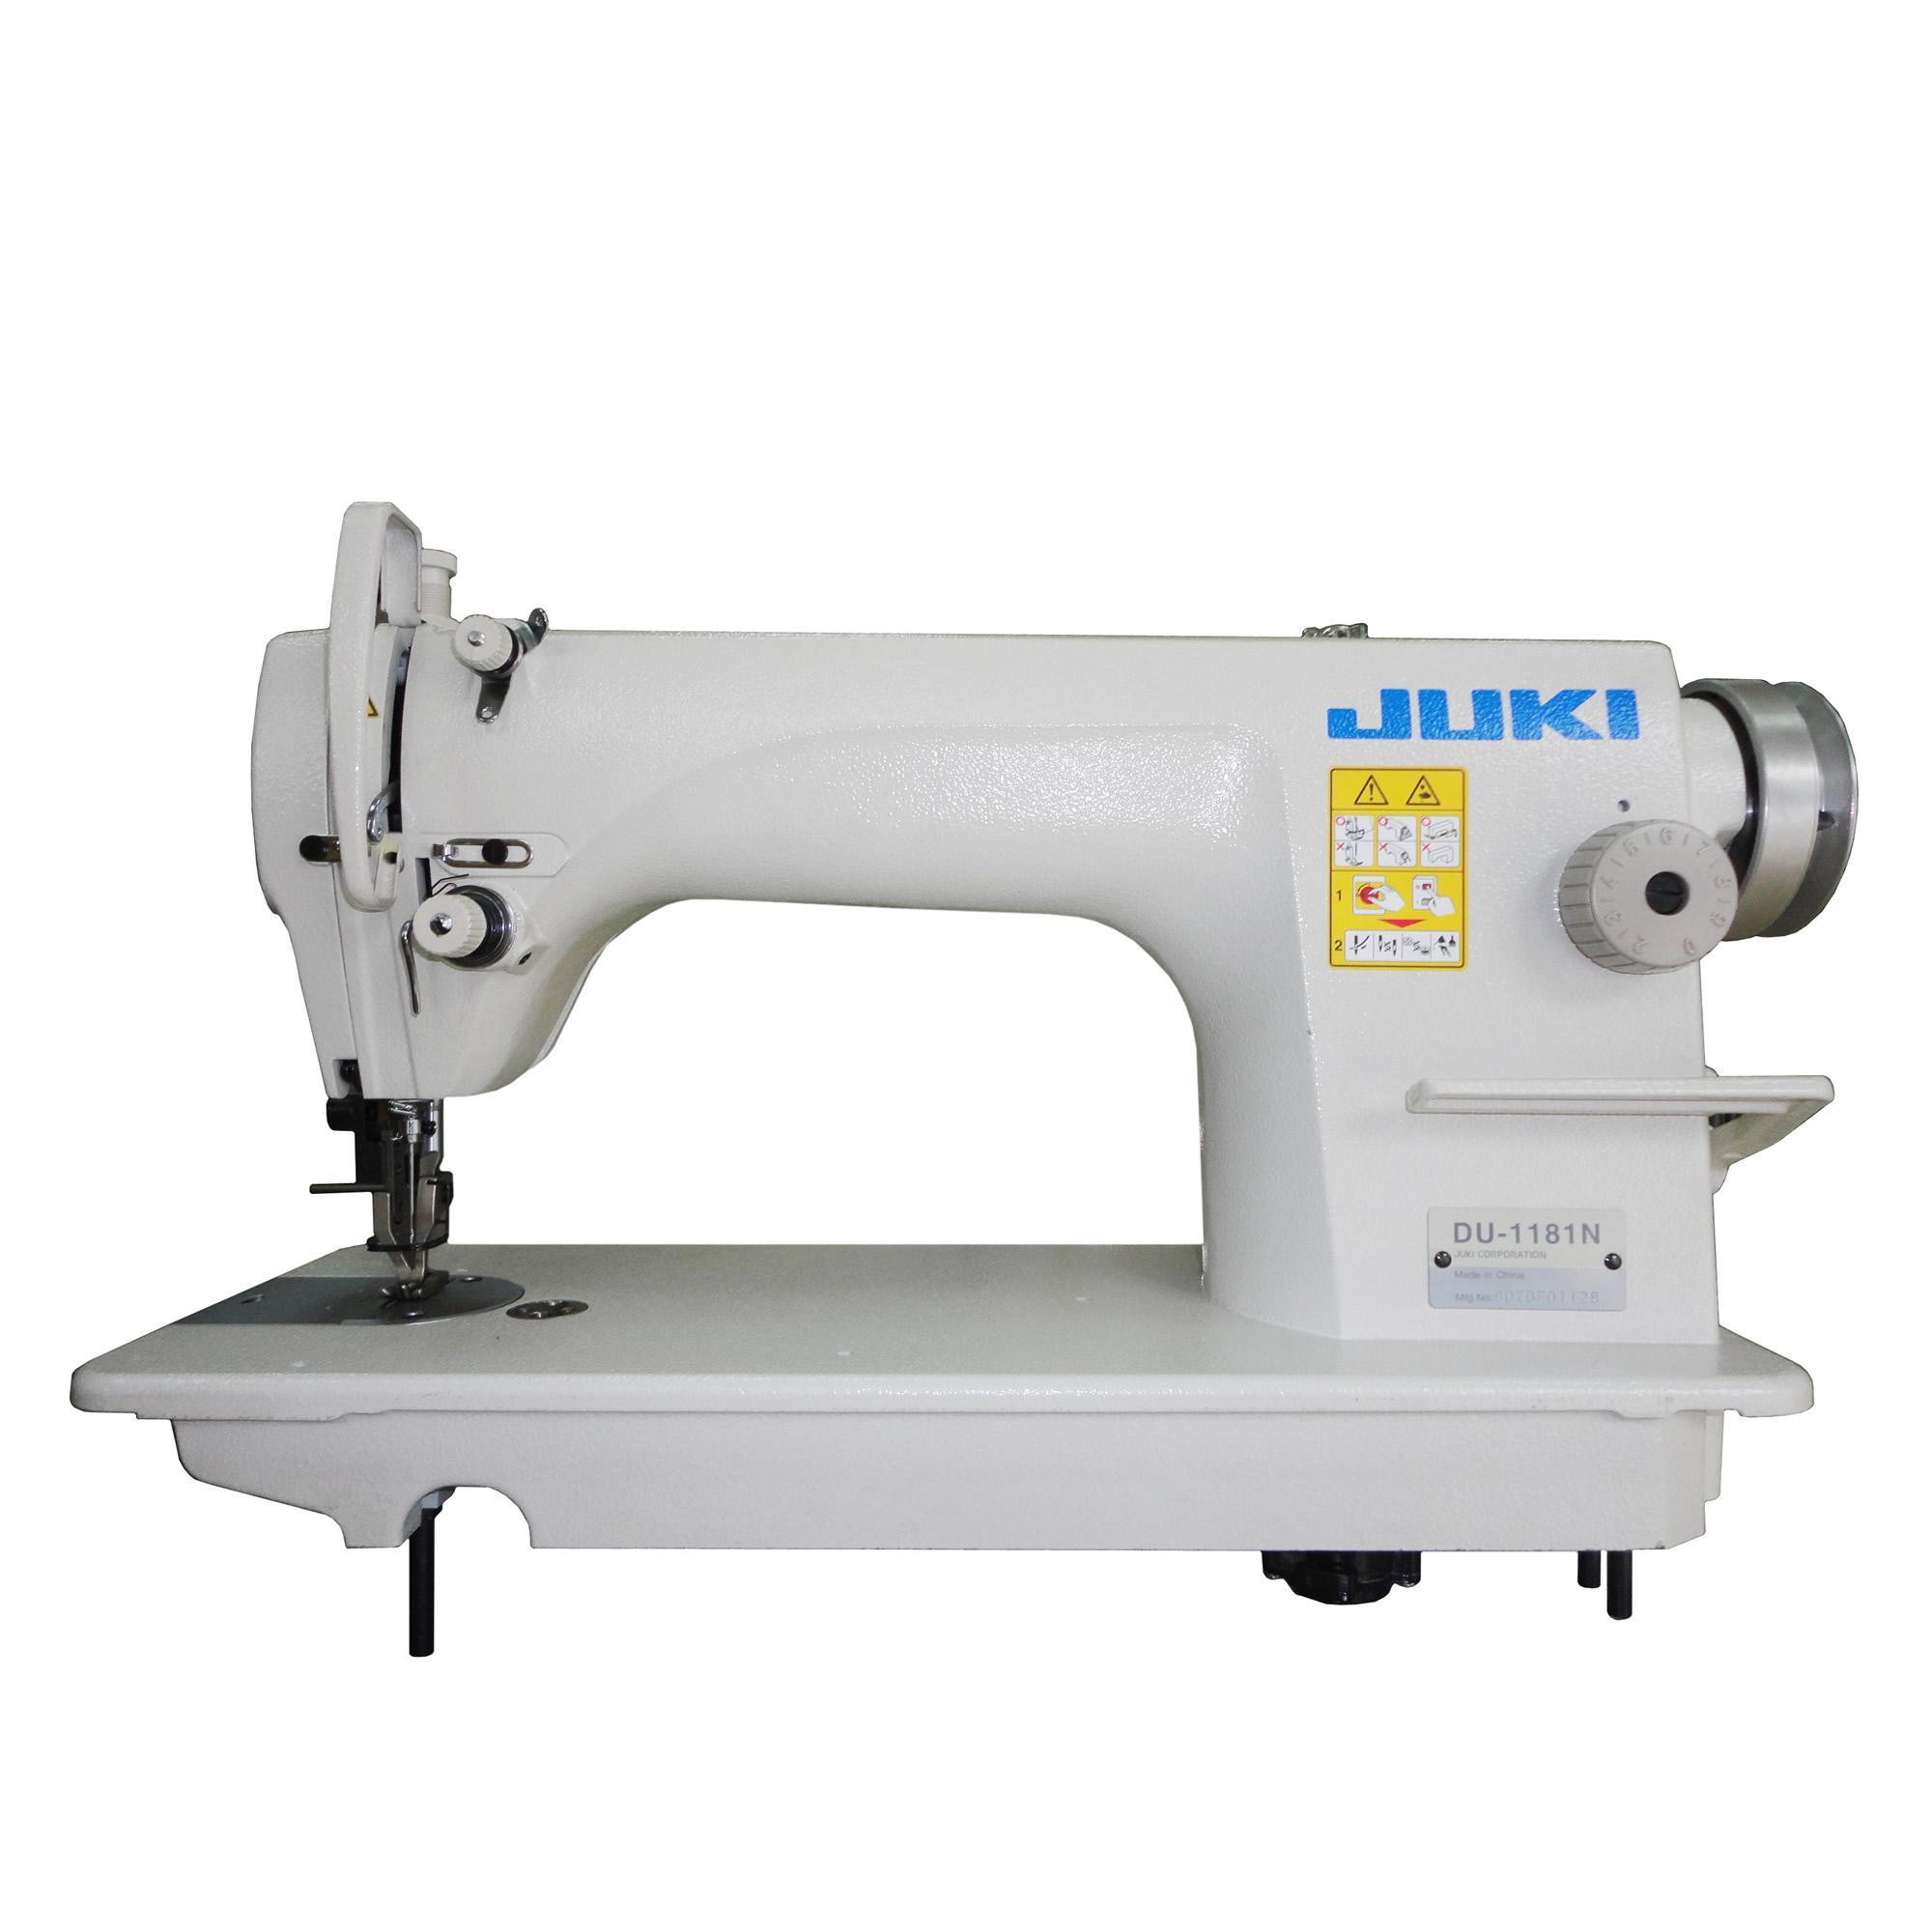 JUKI DU-1181N – Find Sewing Machine